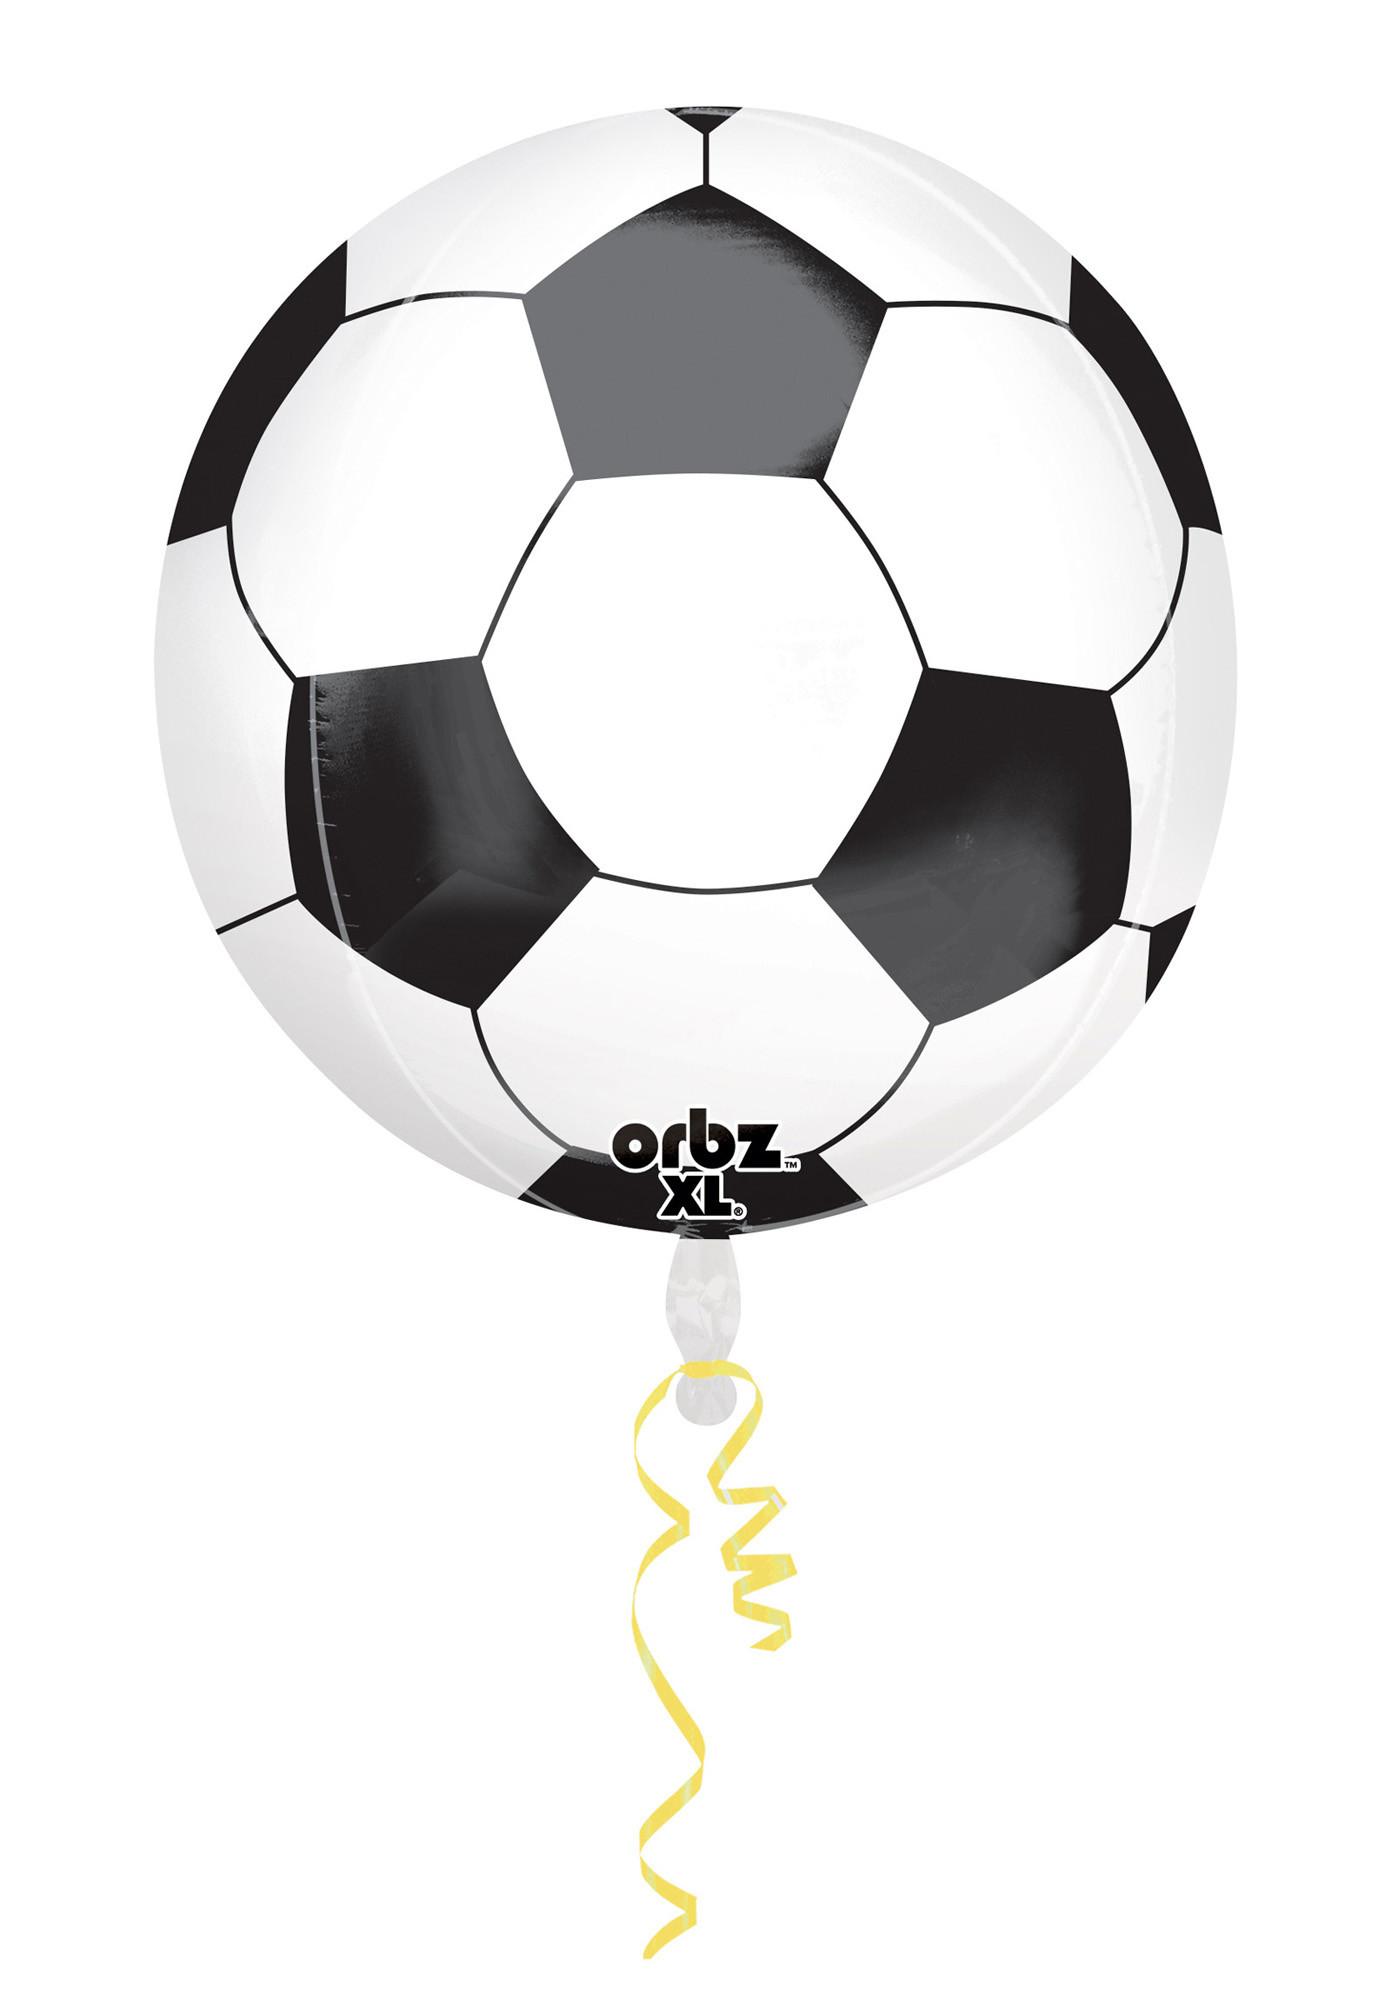 Folien Ballon Fussball Ballon Und Partyshop